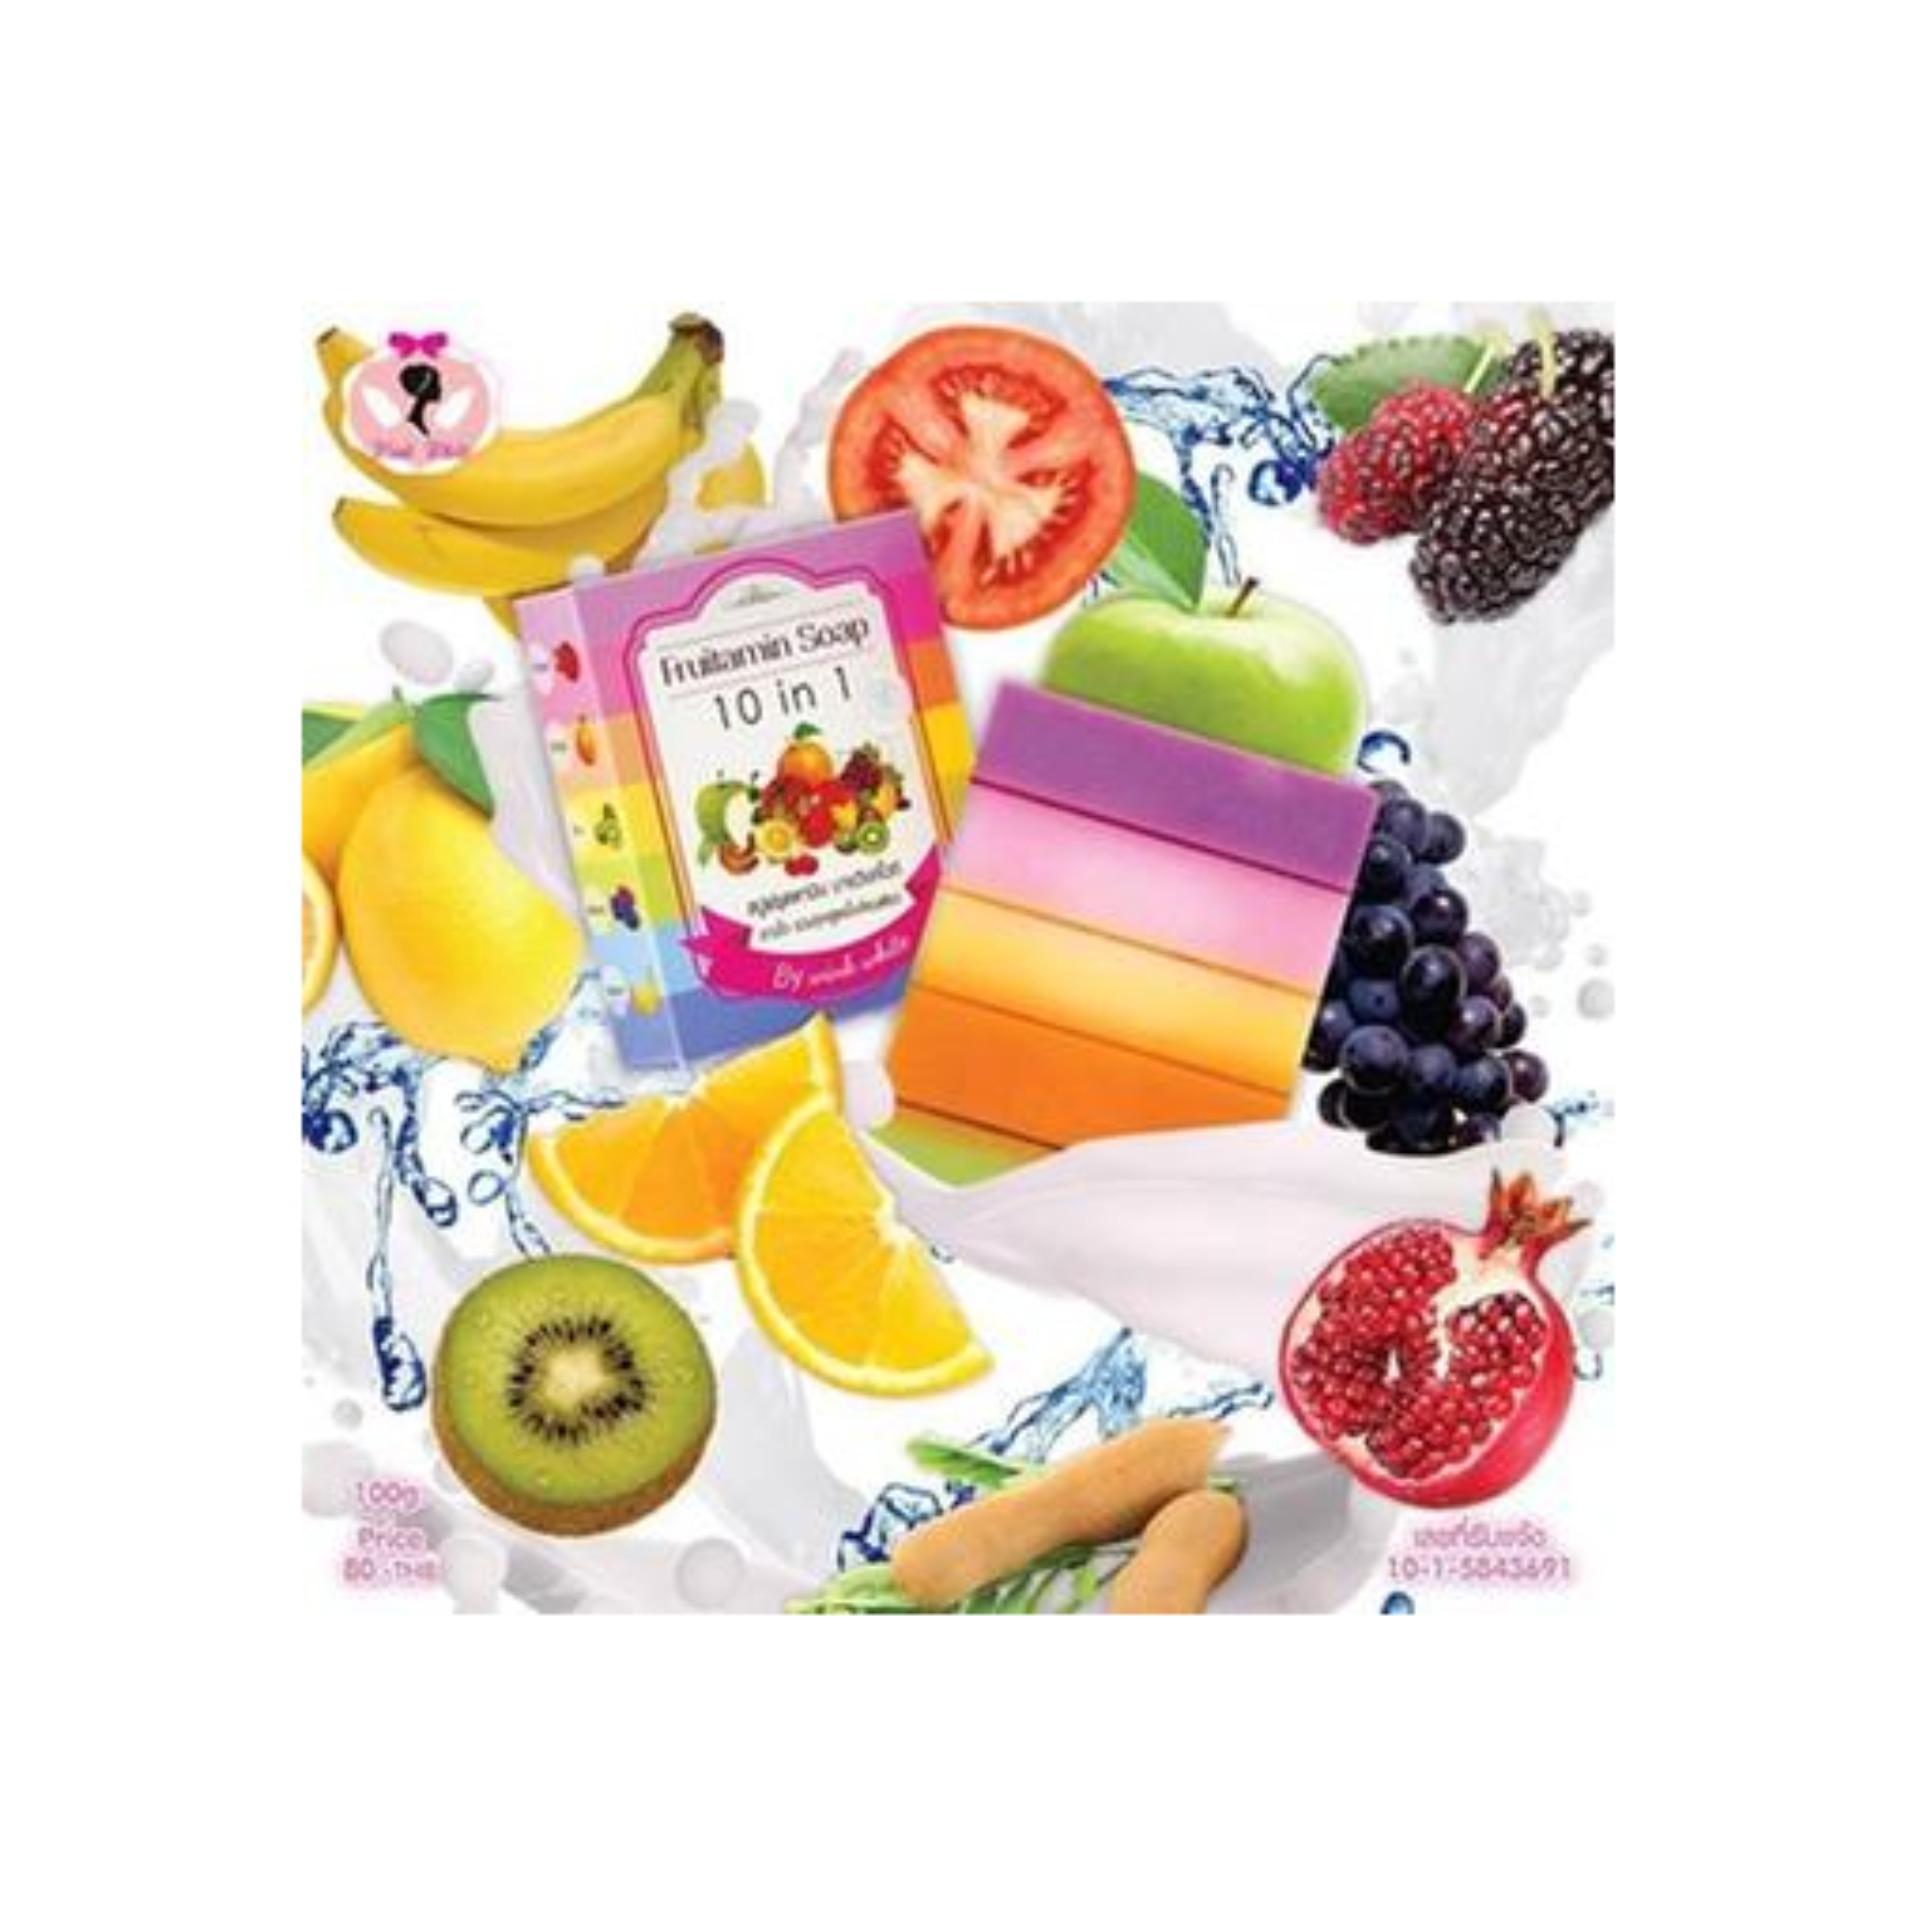 Cek Harga Baru Fruitamin Soap Sabun Frutamin Original Thailand Fruity 10in1 Bpom Rainbow Best Seller Pemutih By Wink White